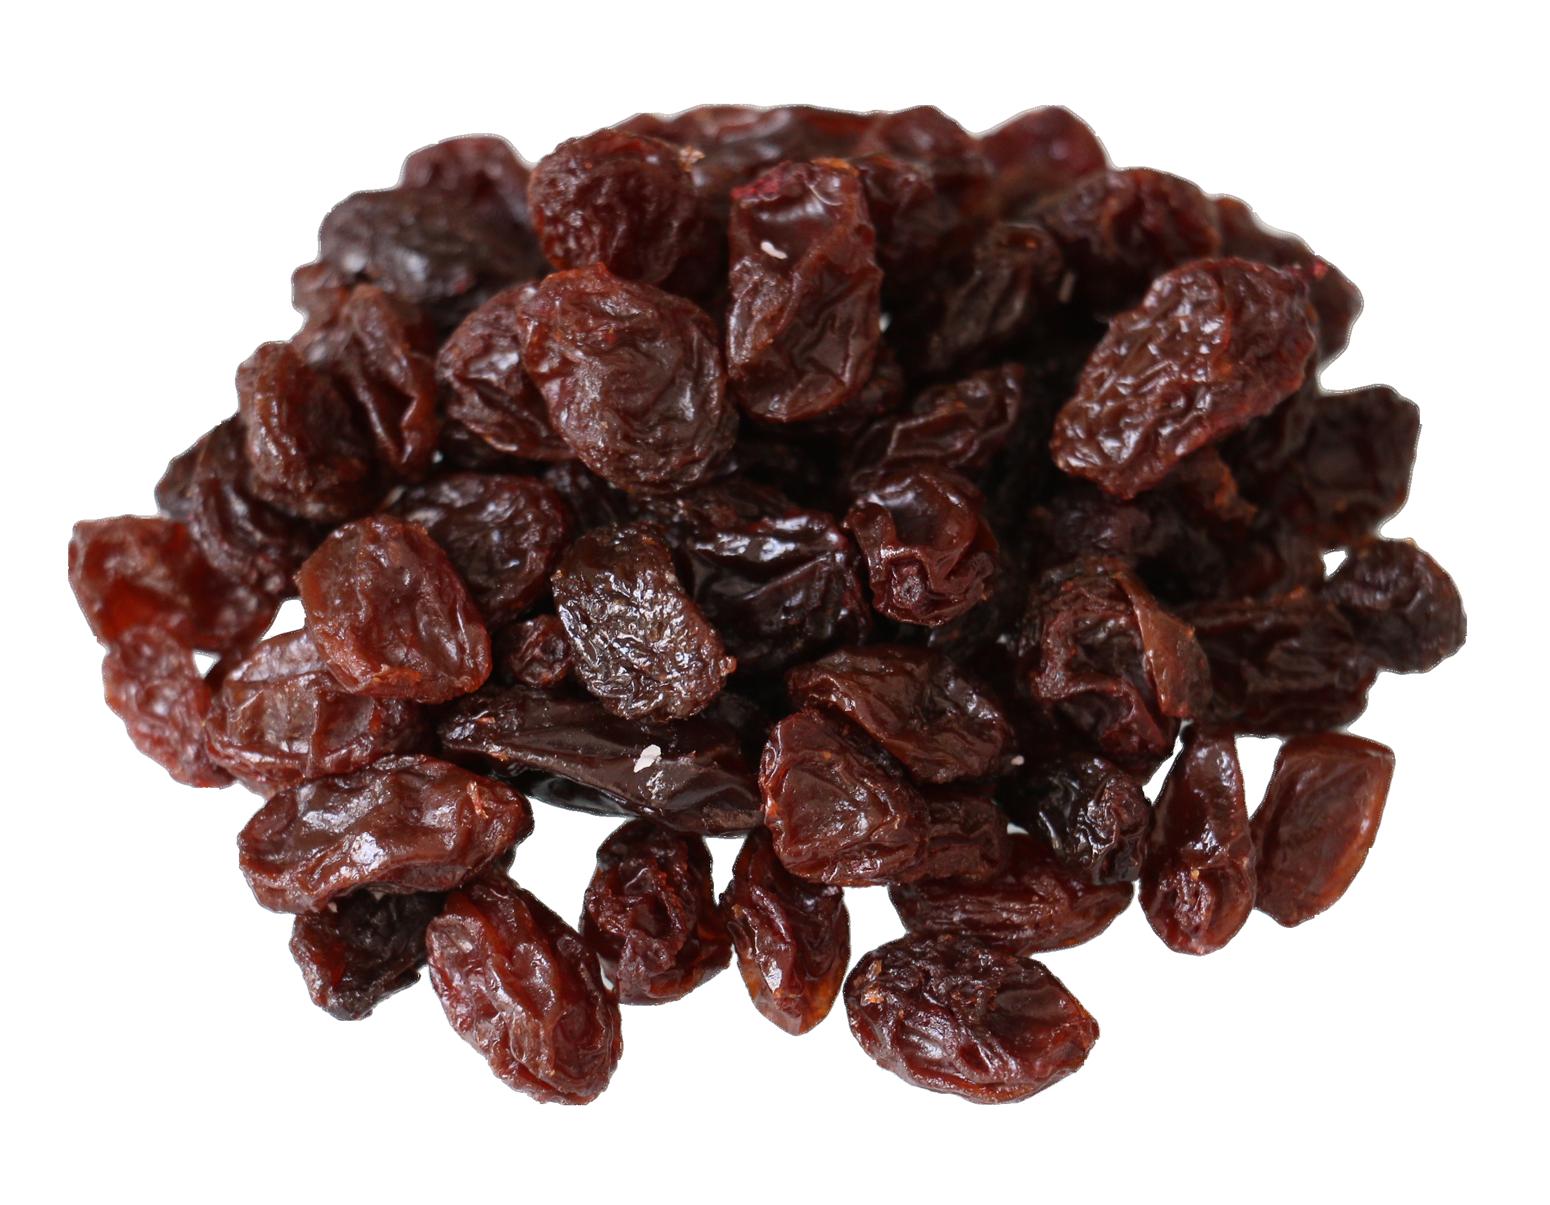 Raisins PNG Image